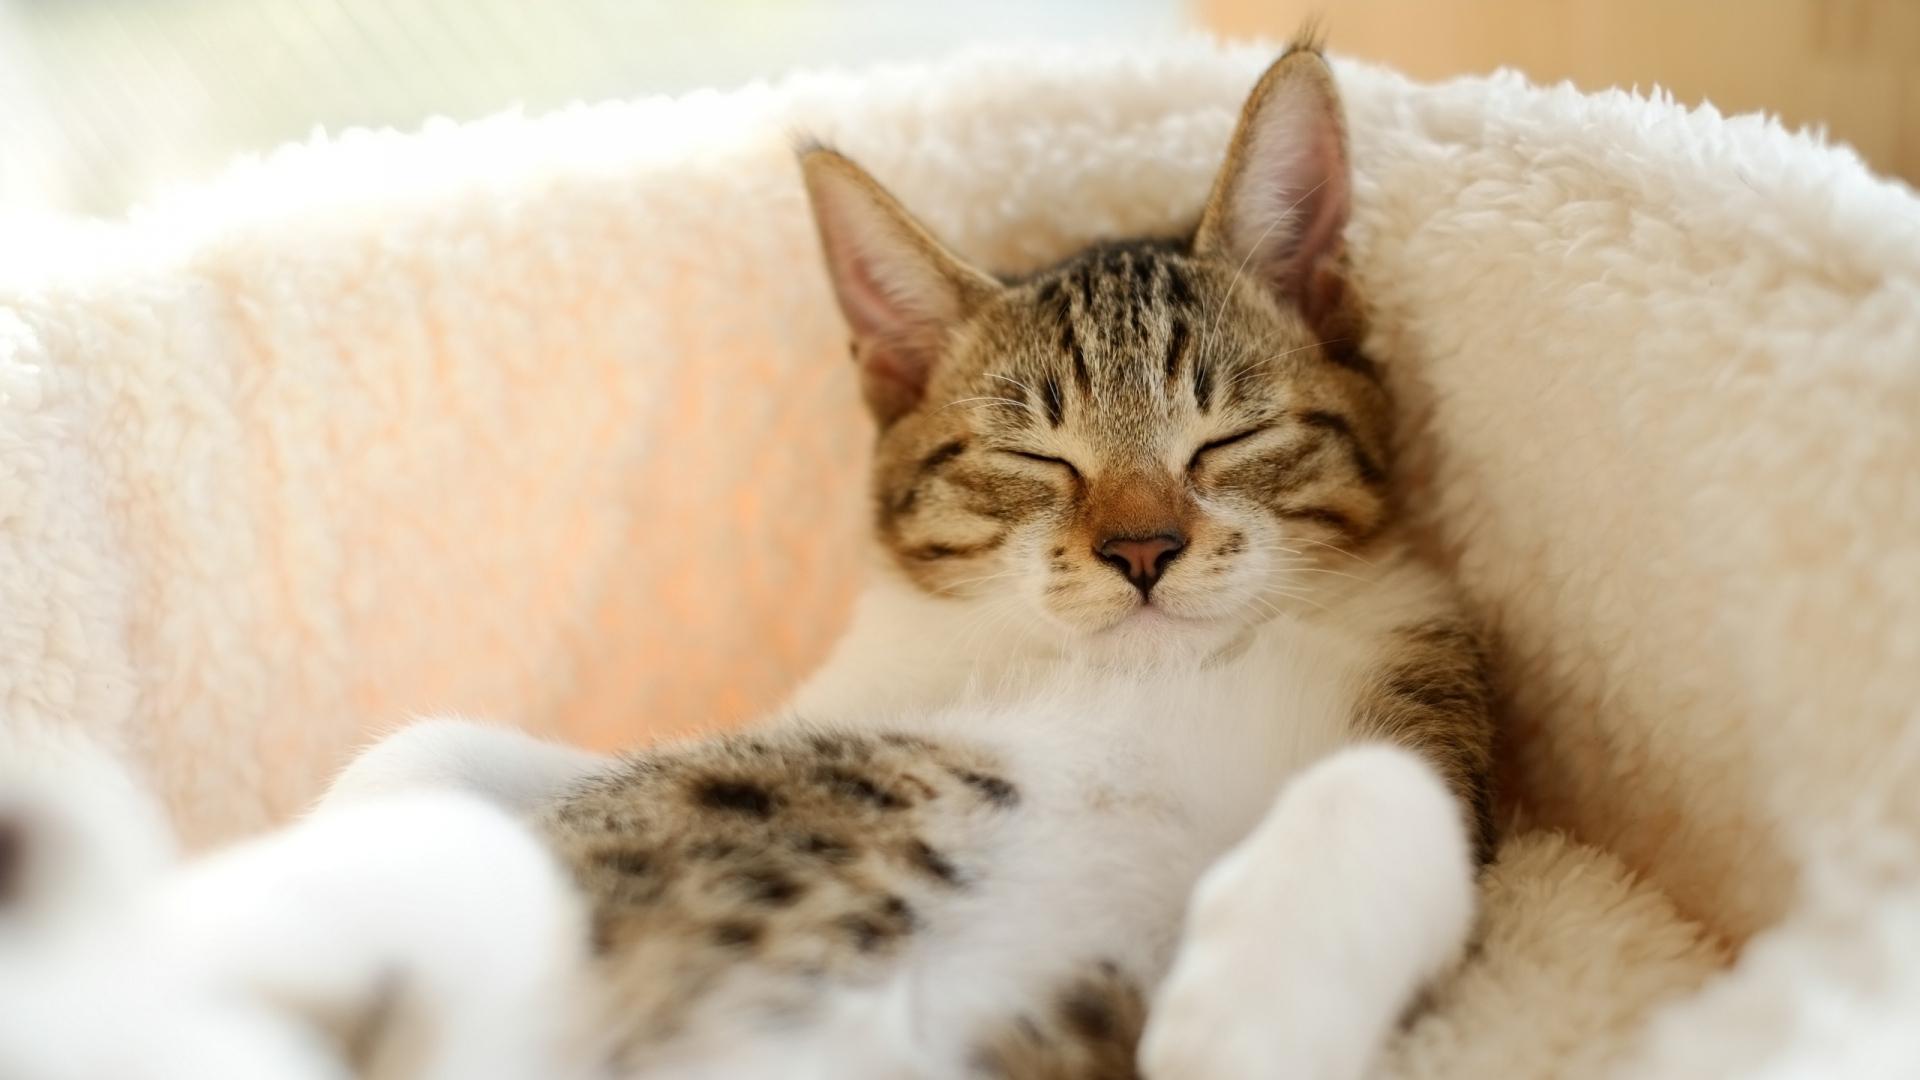 Cute Kitty Wallpaper Cats Sf Wallpaper